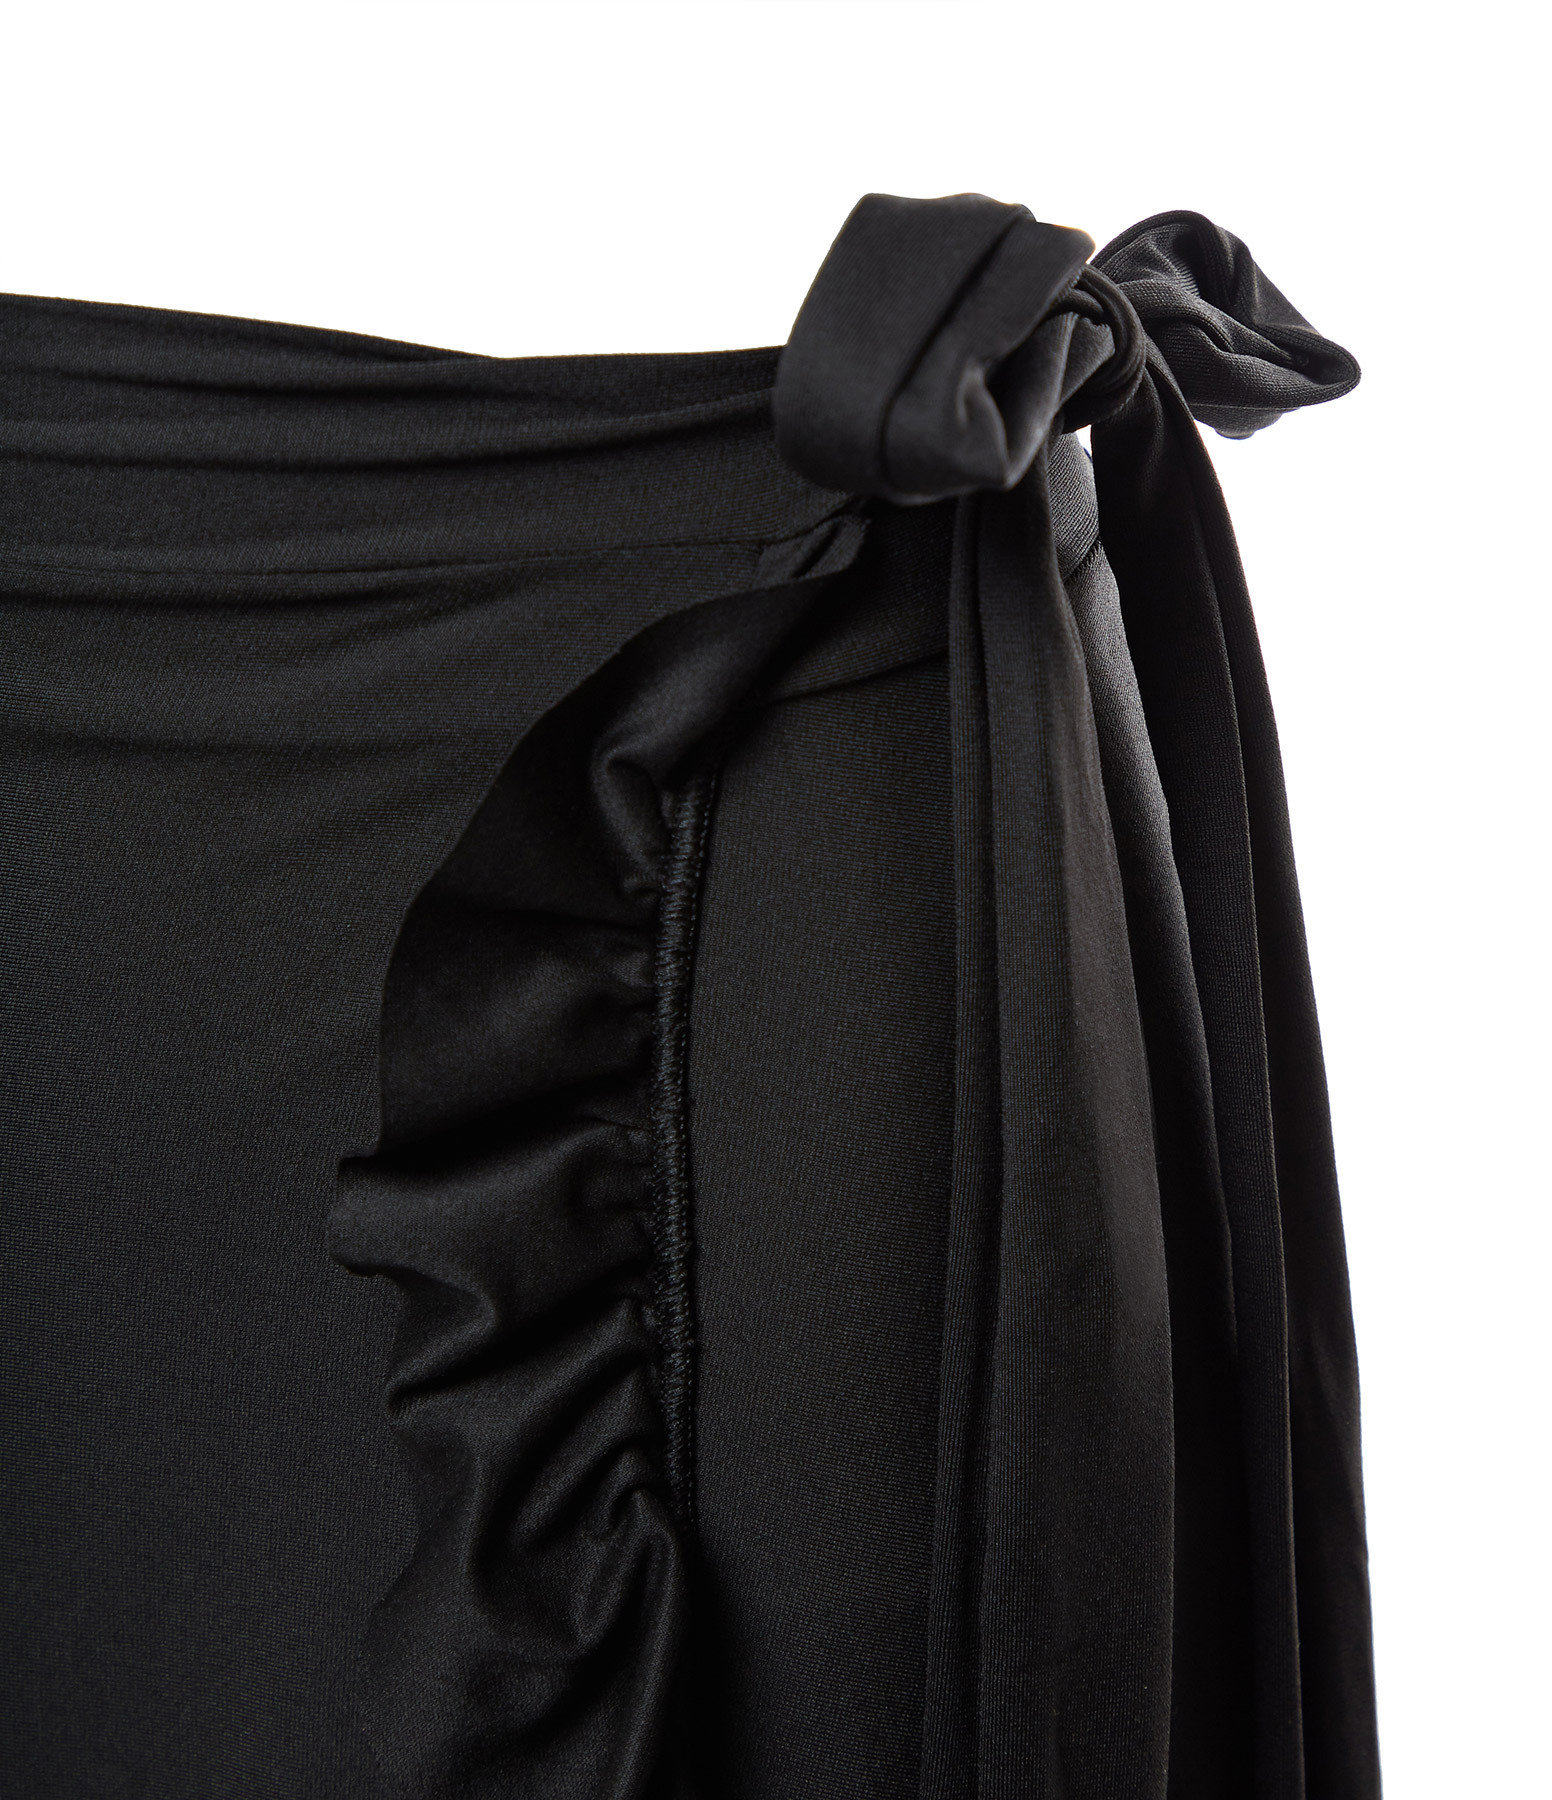 CALARENA - Jupe Incontournable Idylle Noir